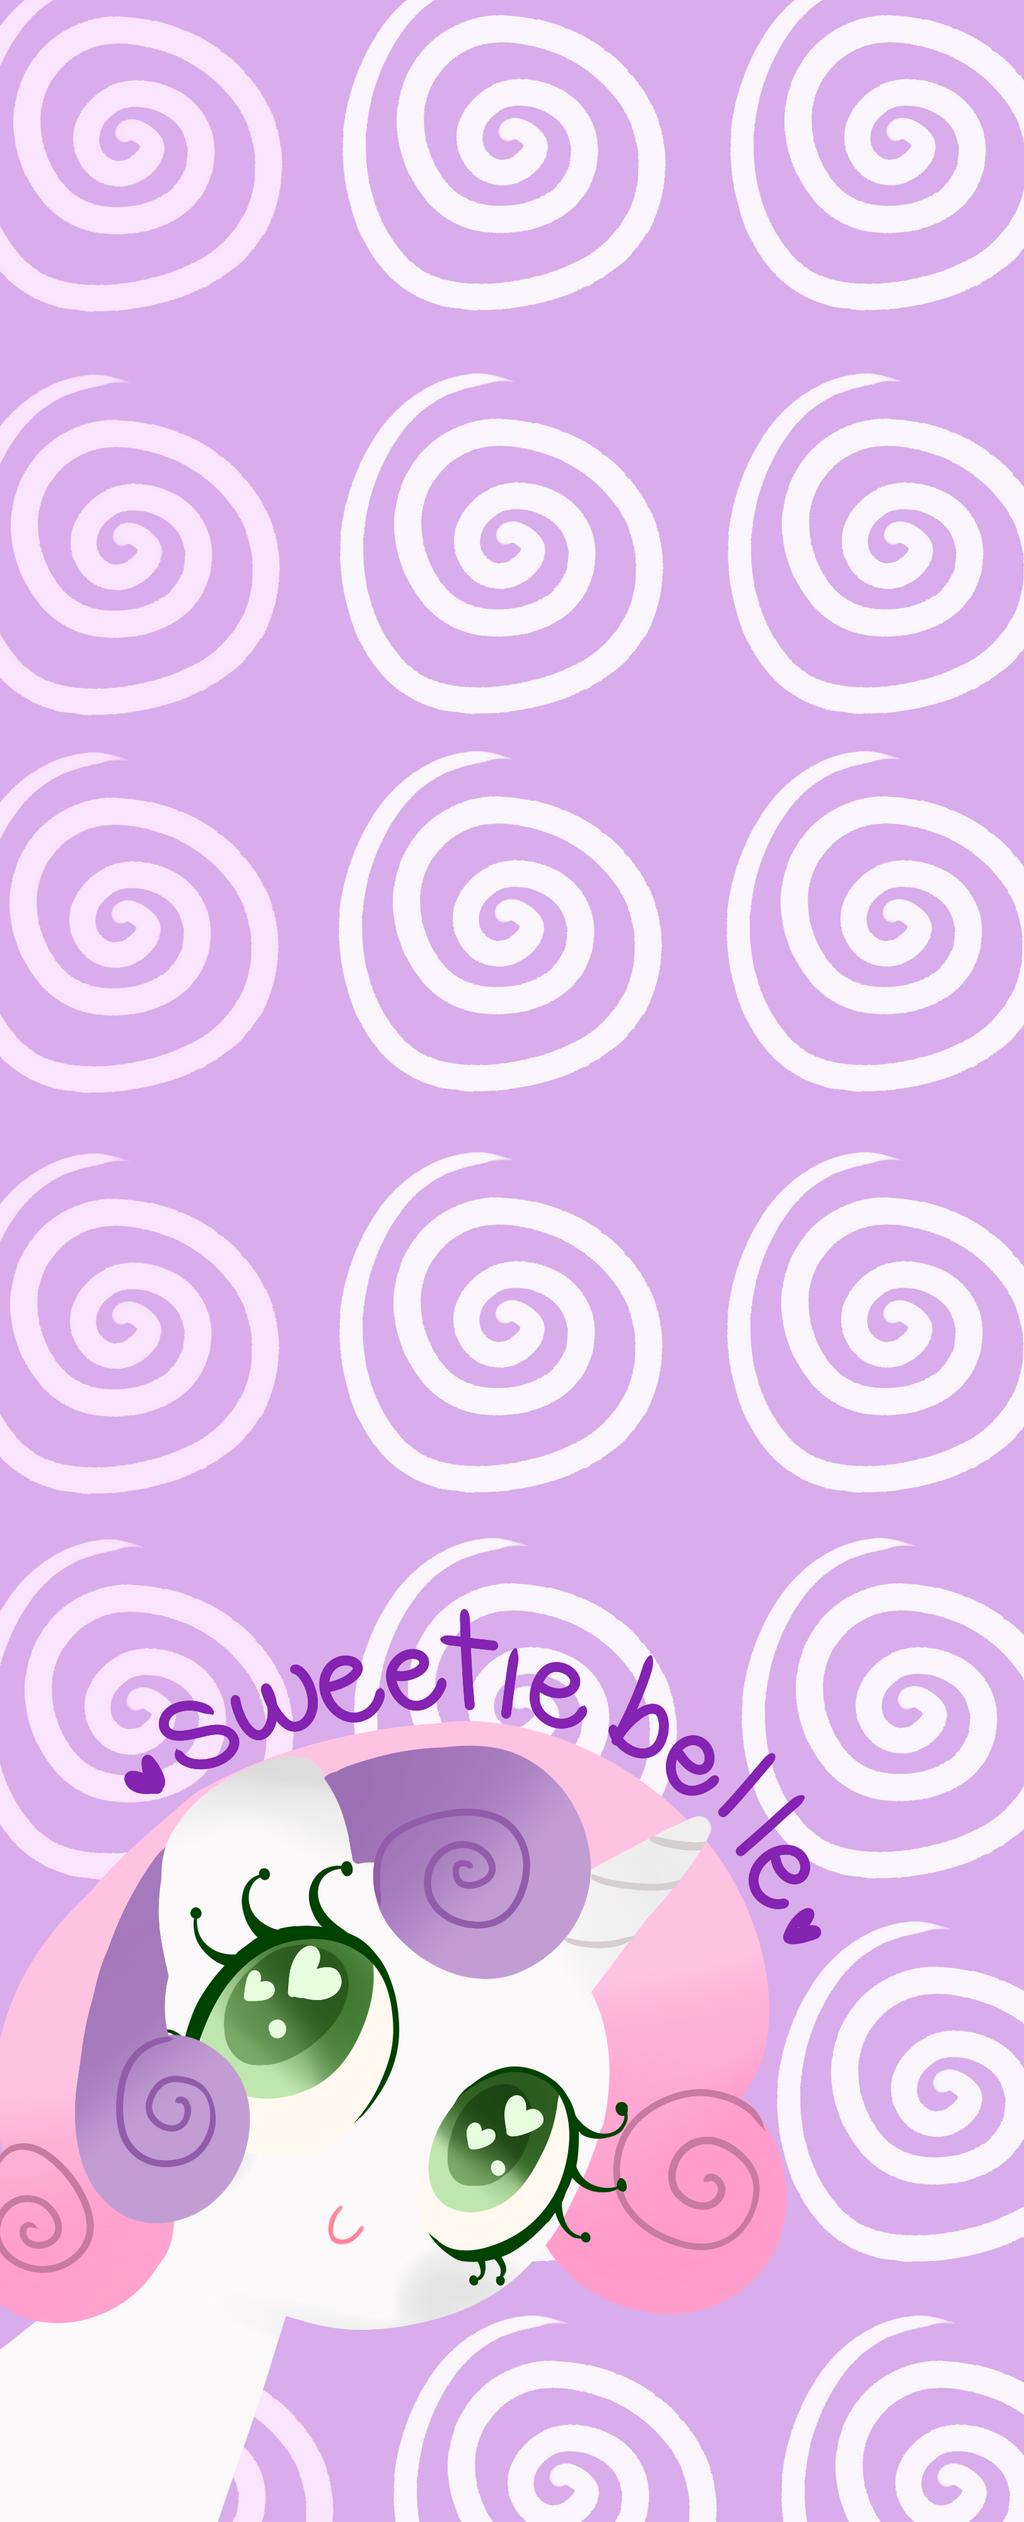 Sweetiebook by CosmicPonye